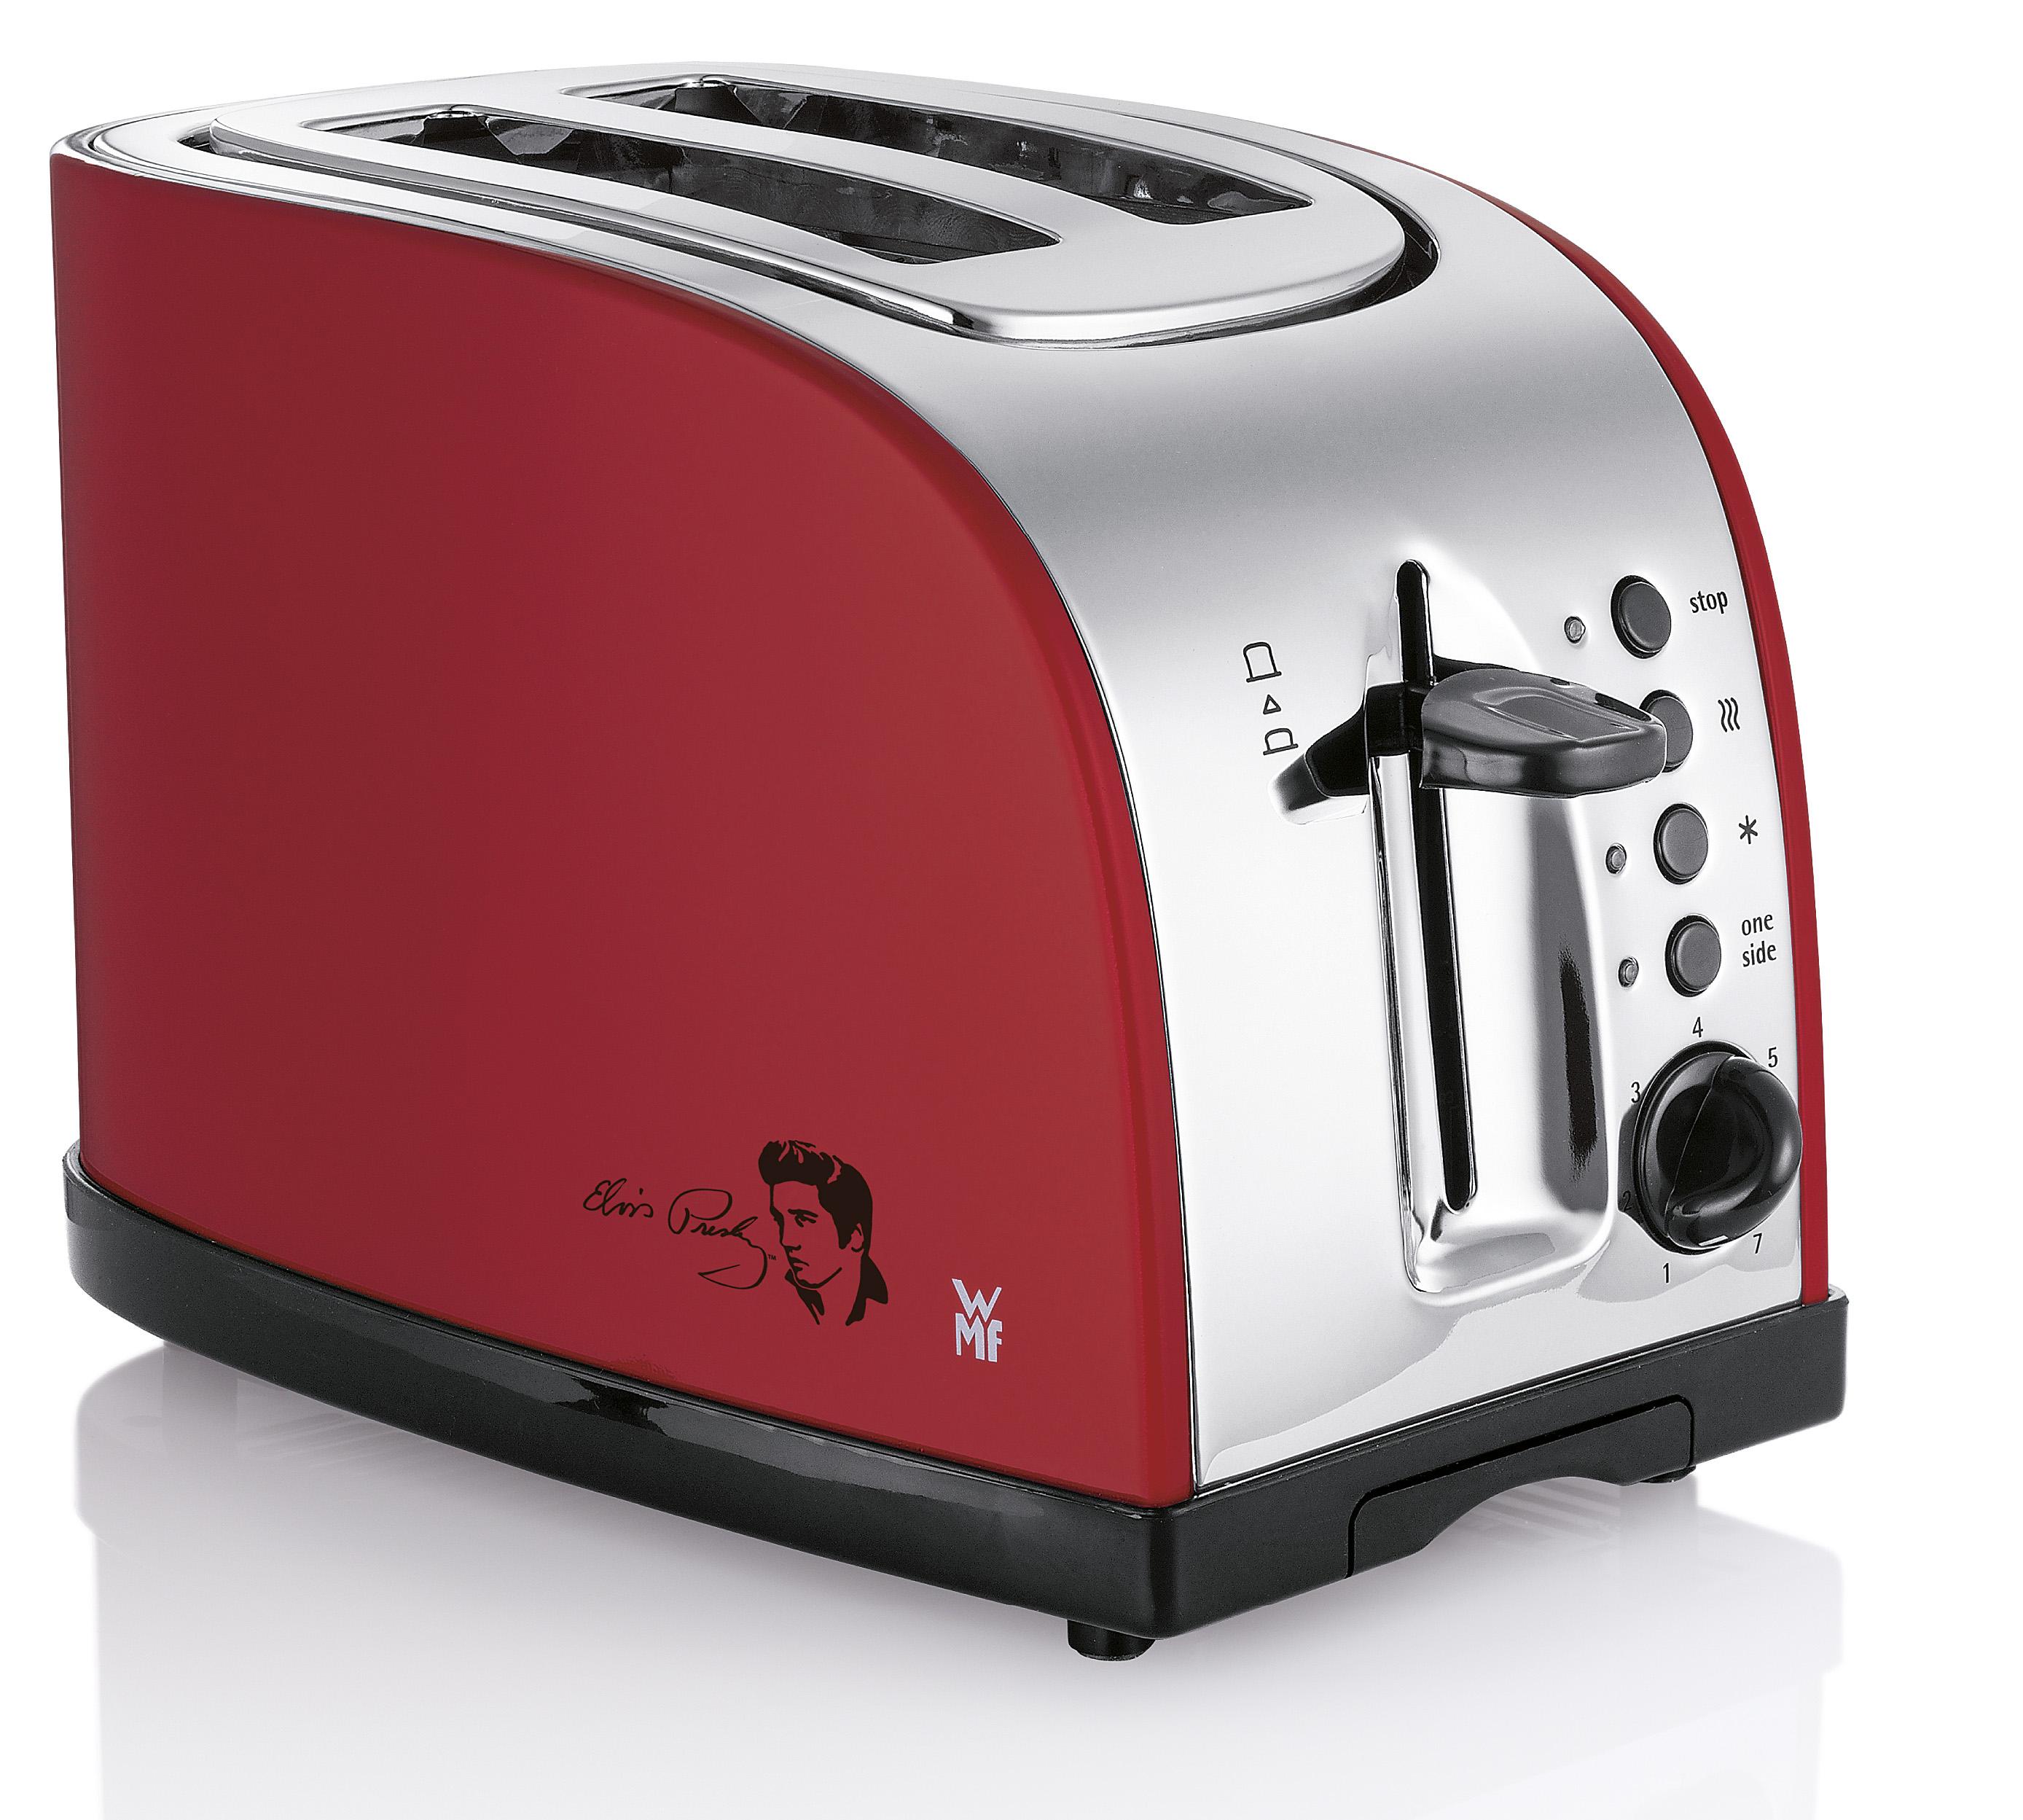 wmf only you toaster mit toasts und elvis schwungvoll. Black Bedroom Furniture Sets. Home Design Ideas